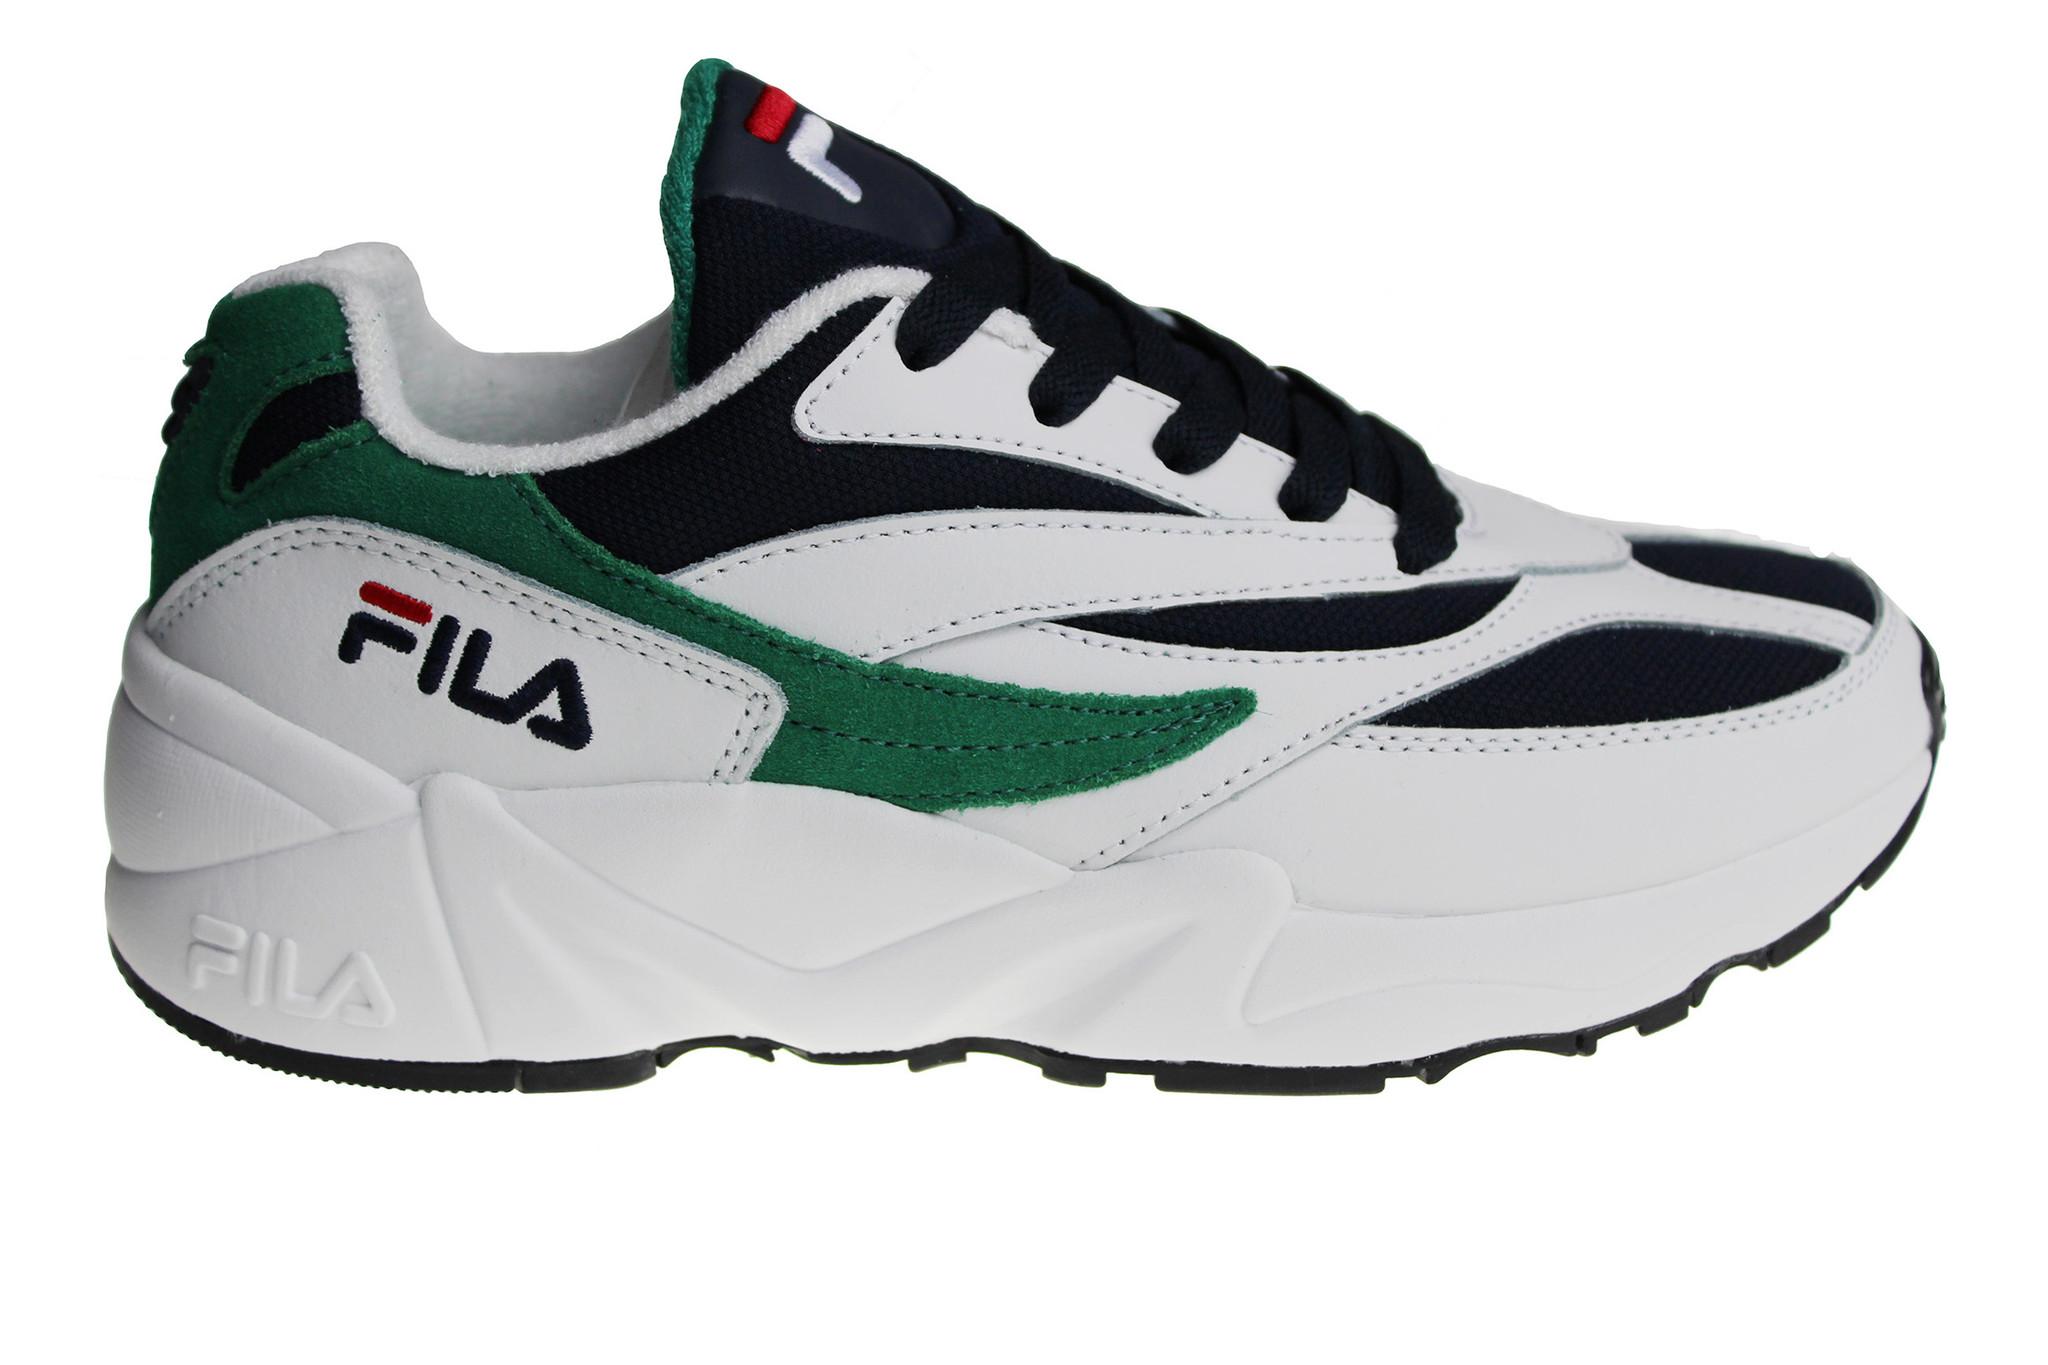 8ae9ccaa Fila V94M Low (White/Green/Black) 1010255.00Q Men's